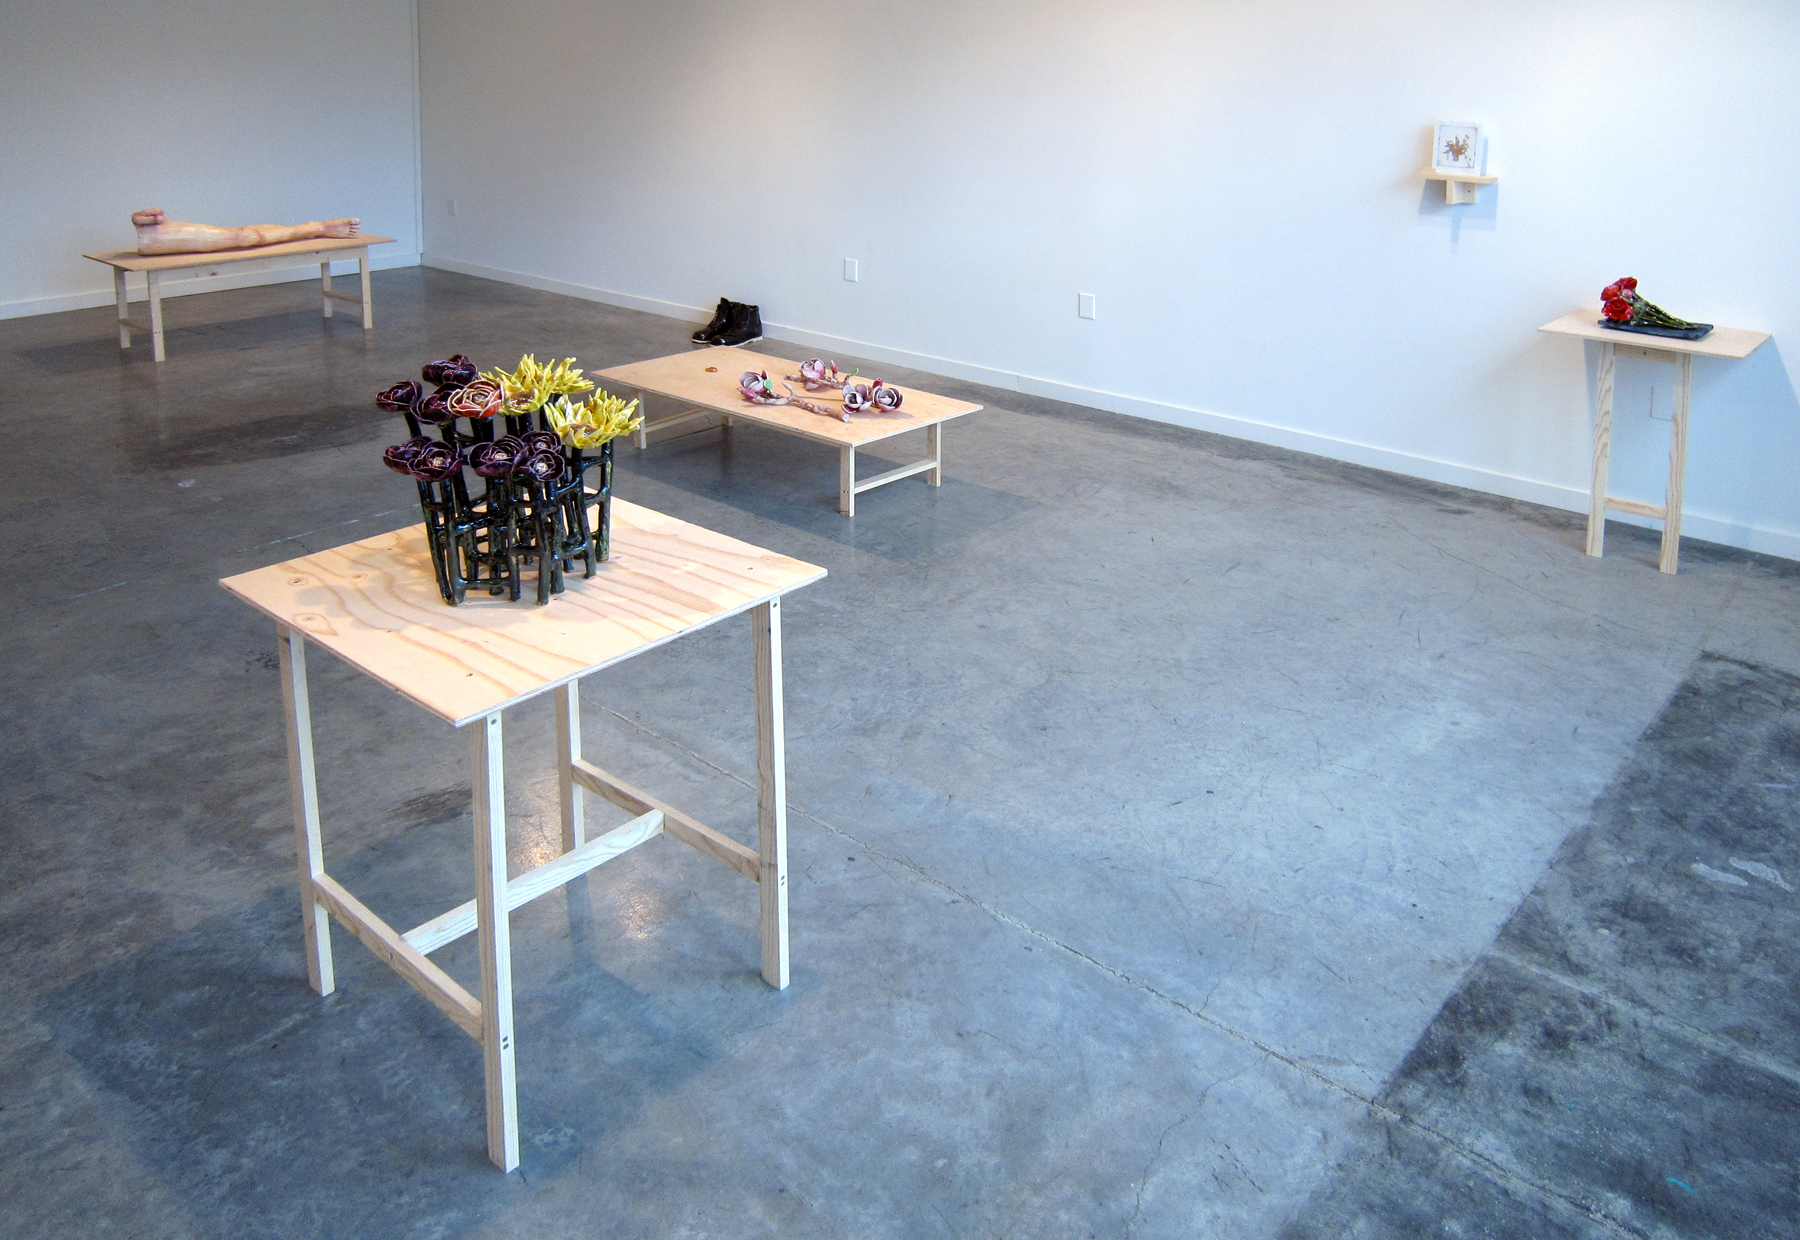 ERIK SCOLLON   A Moment Lasts Forever Until It's Gone , installation